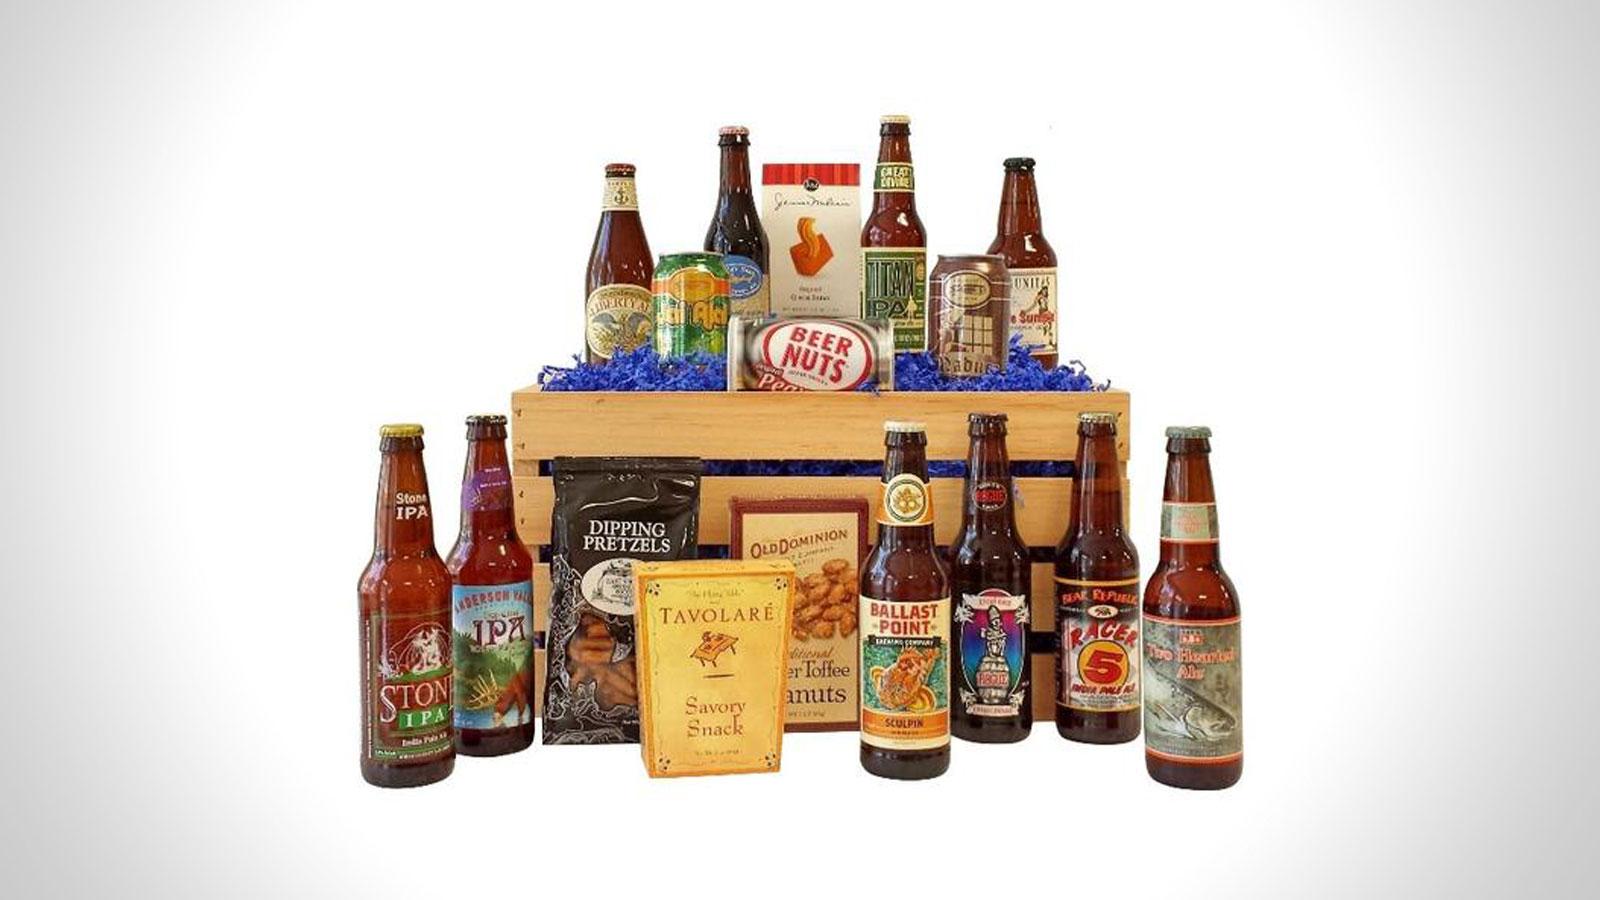 Give Them Beer Gift Baskets   Gifts For Men   Gift Baskets For Men